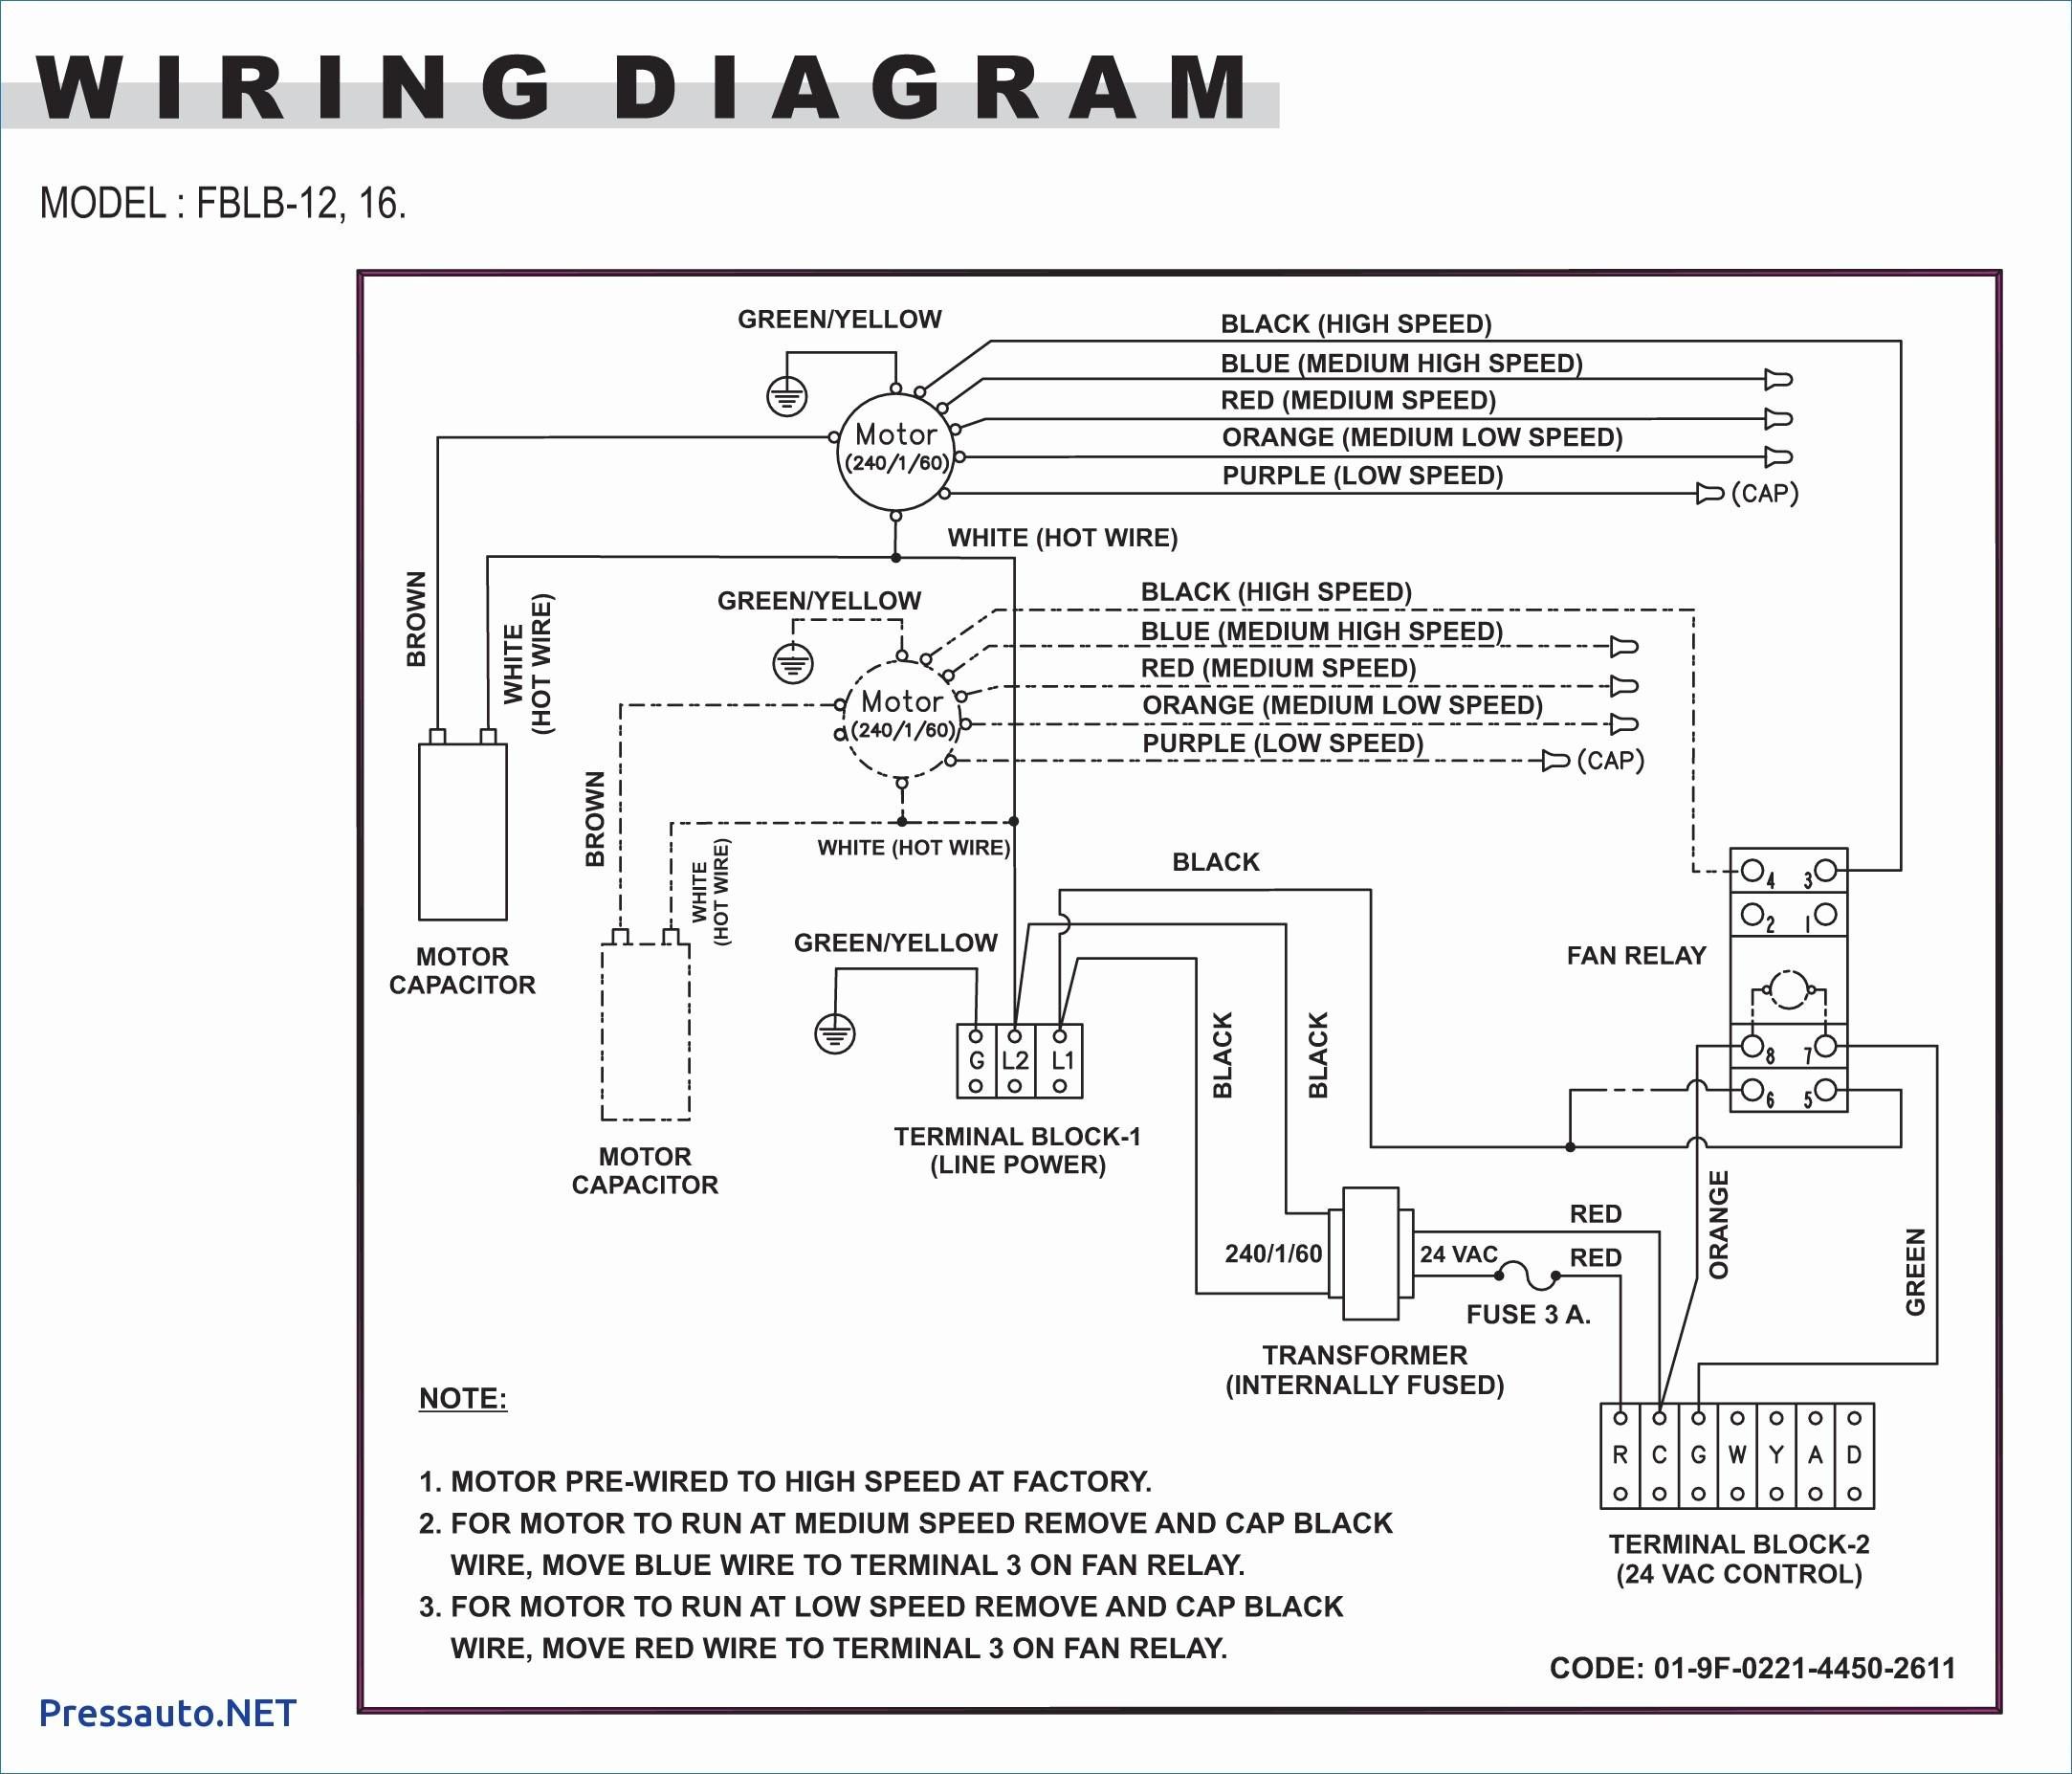 Wiring Diagram for Water Heater Best Wiring Diagram for 220v Baseboard Heater Fresh Baseboard Heaters